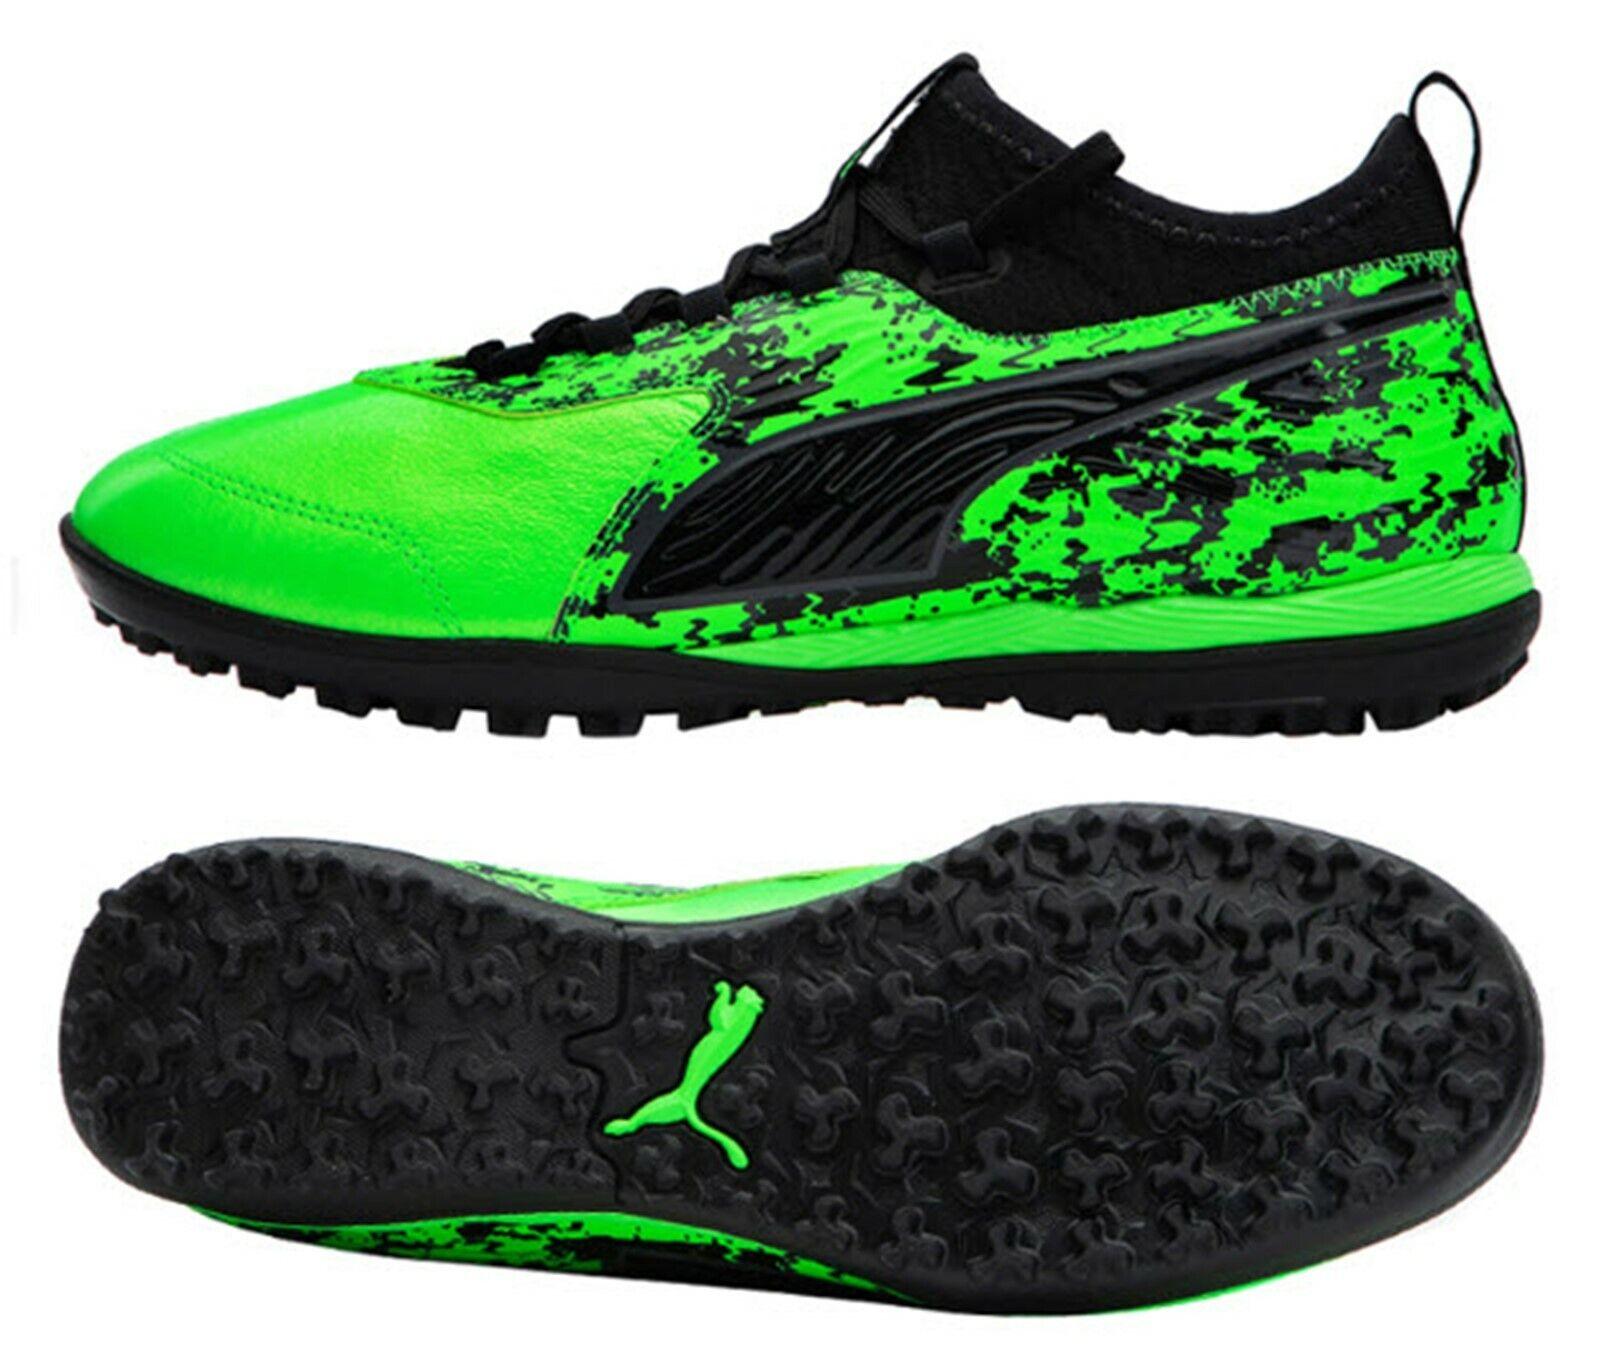 Puma para hombre uno 19.3 netfit TT Botines De Fútbol Zapatos De Futsal verde Gimnasio Spike 10548903